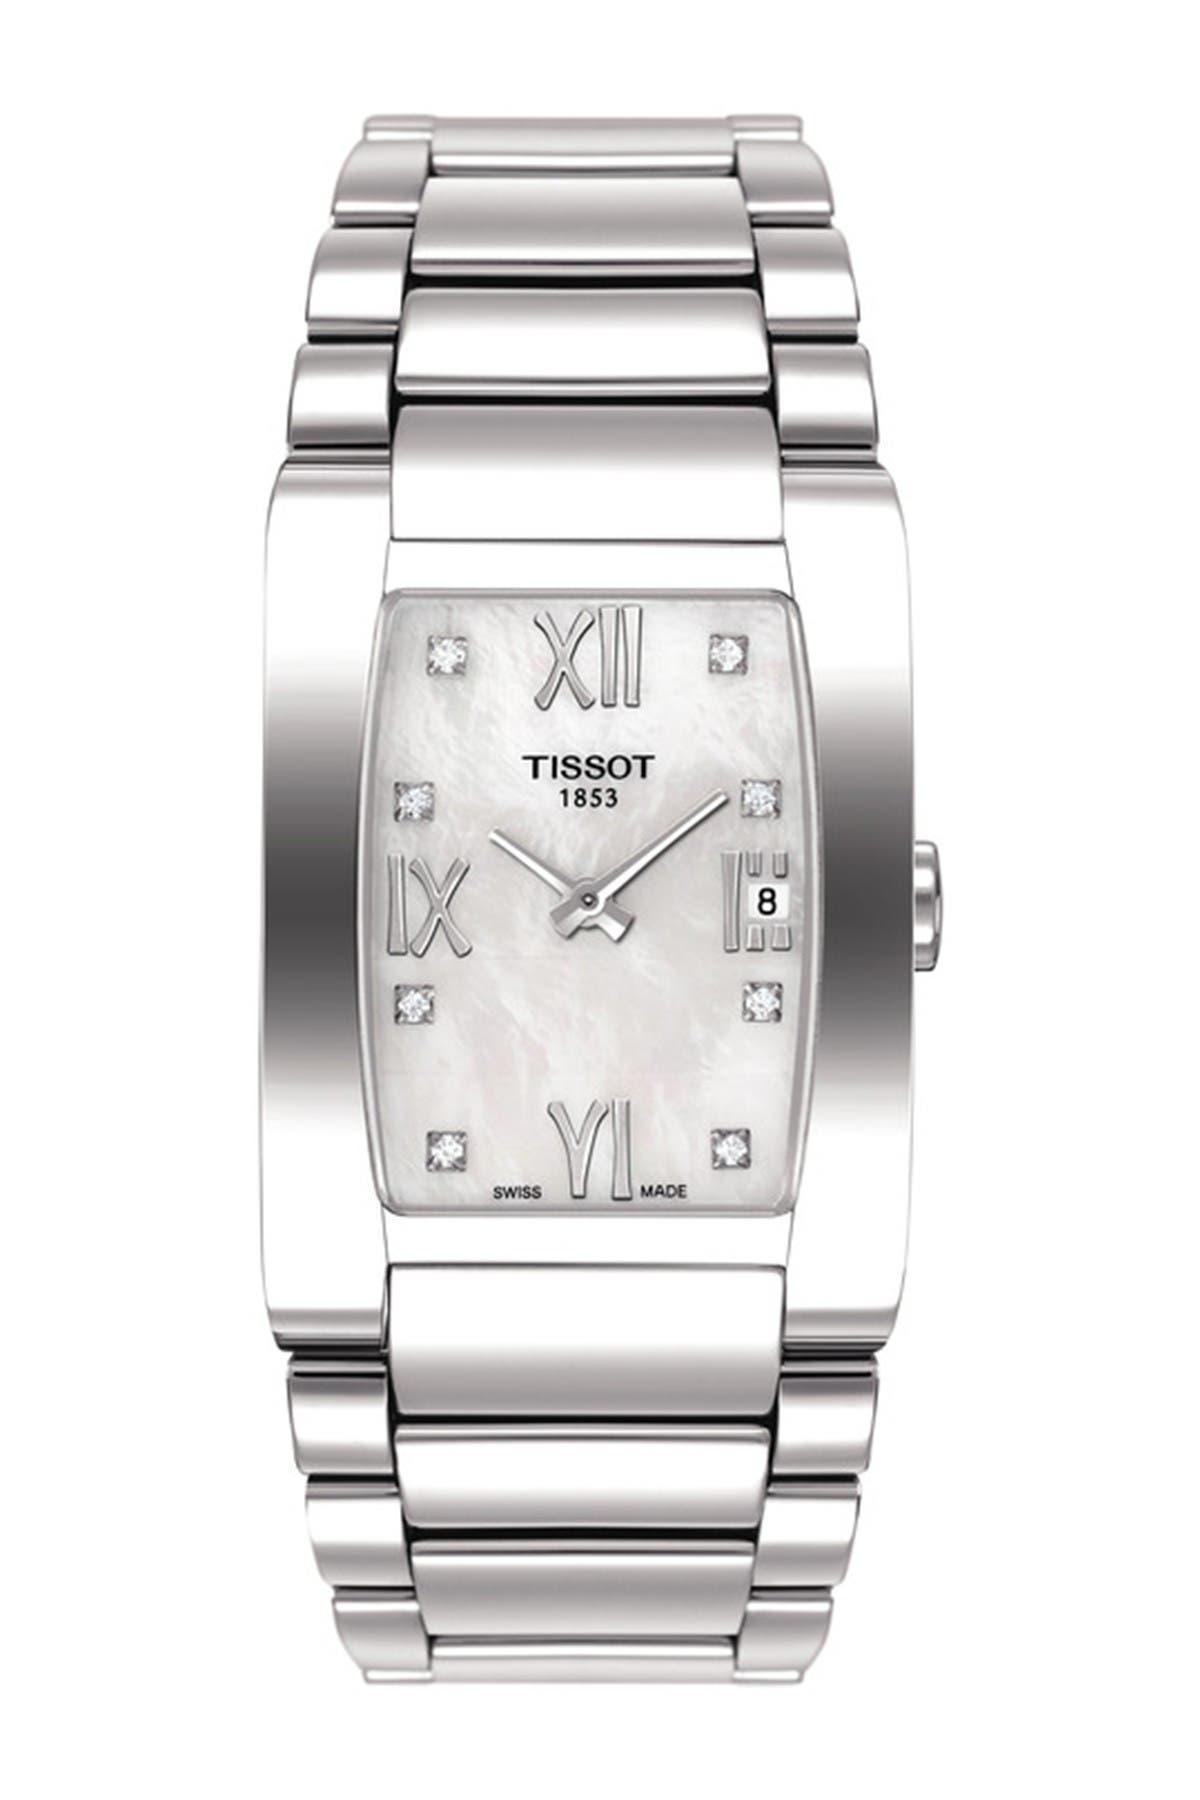 Image of Tissot Women's Generosi-T Diamond Bracelet Watch, 25mm - 0.073 ctw